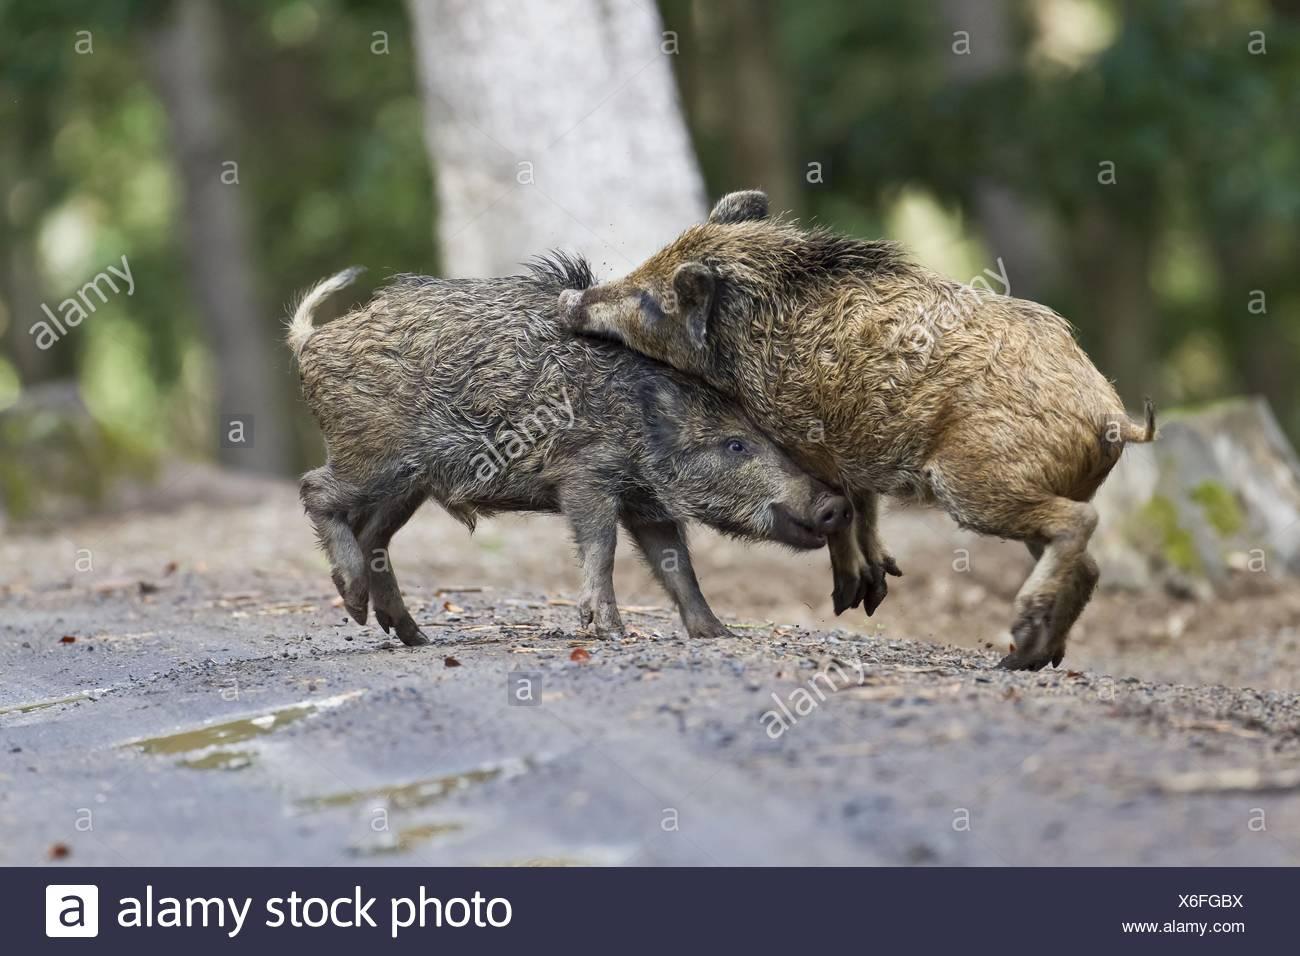 wild hogs - Stock Image